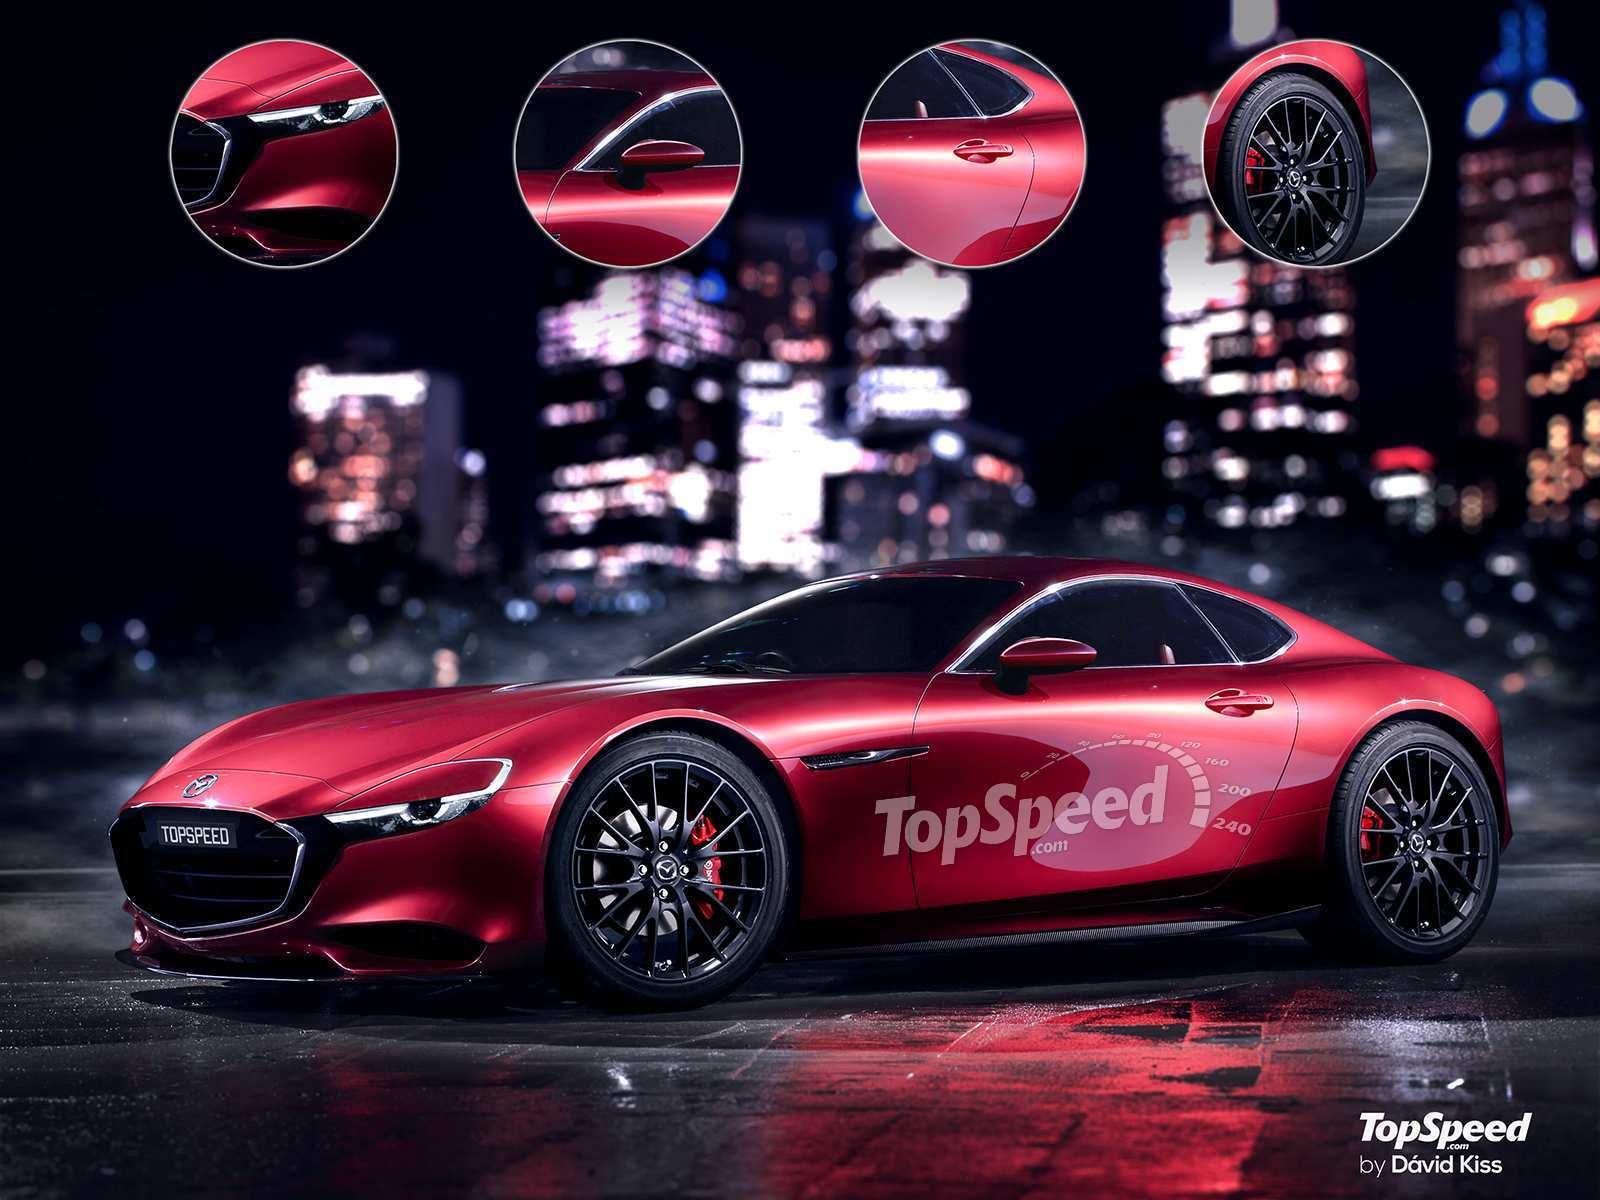 43 All New Rx Mazda 2019 Spesification Redesign by Rx Mazda 2019 Spesification